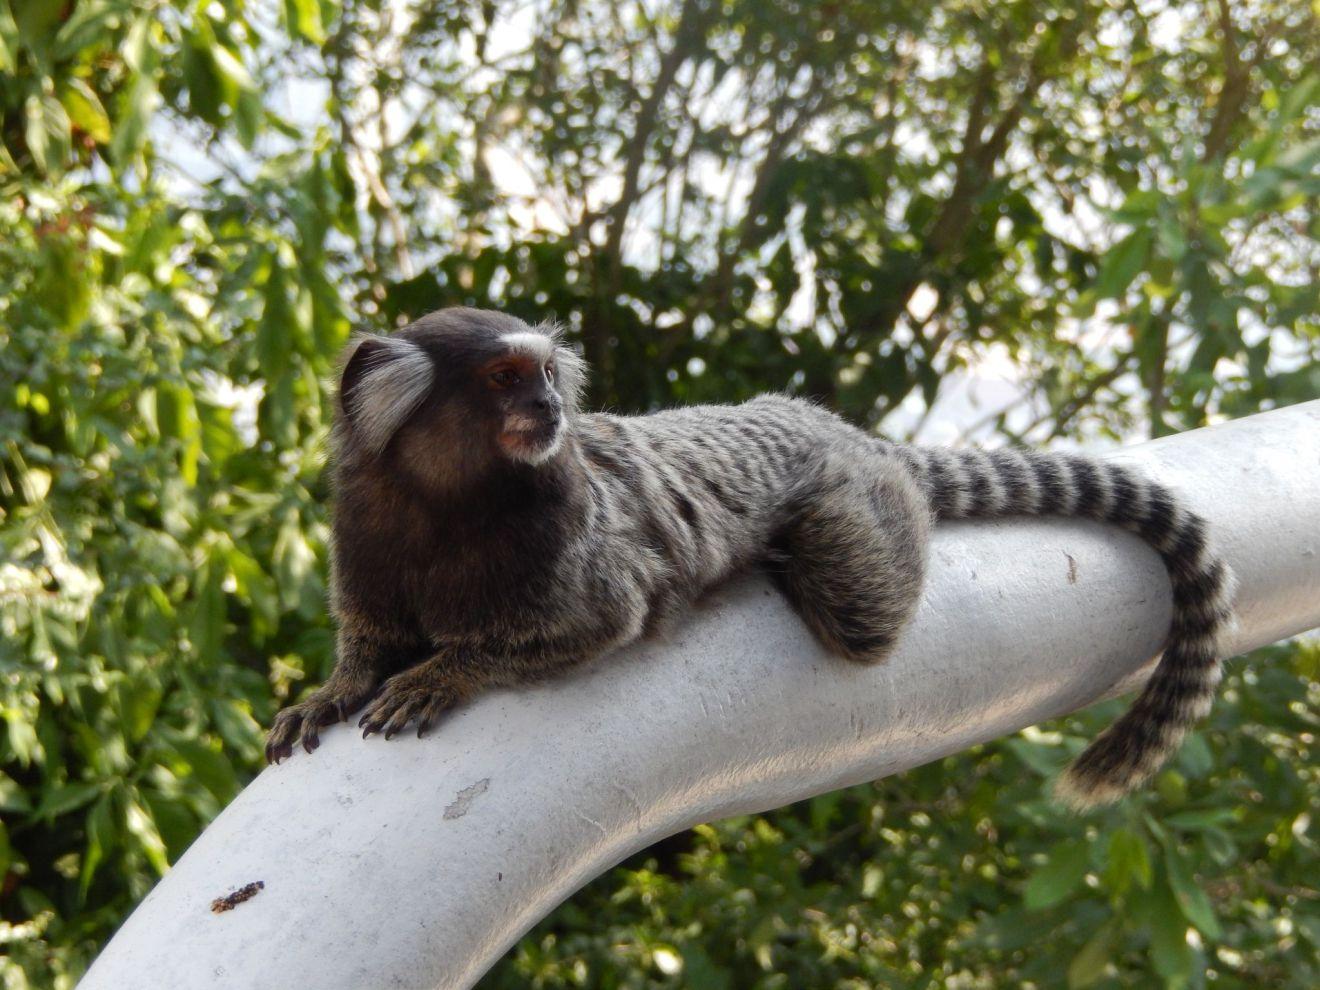 Copacabana a monkey on railing